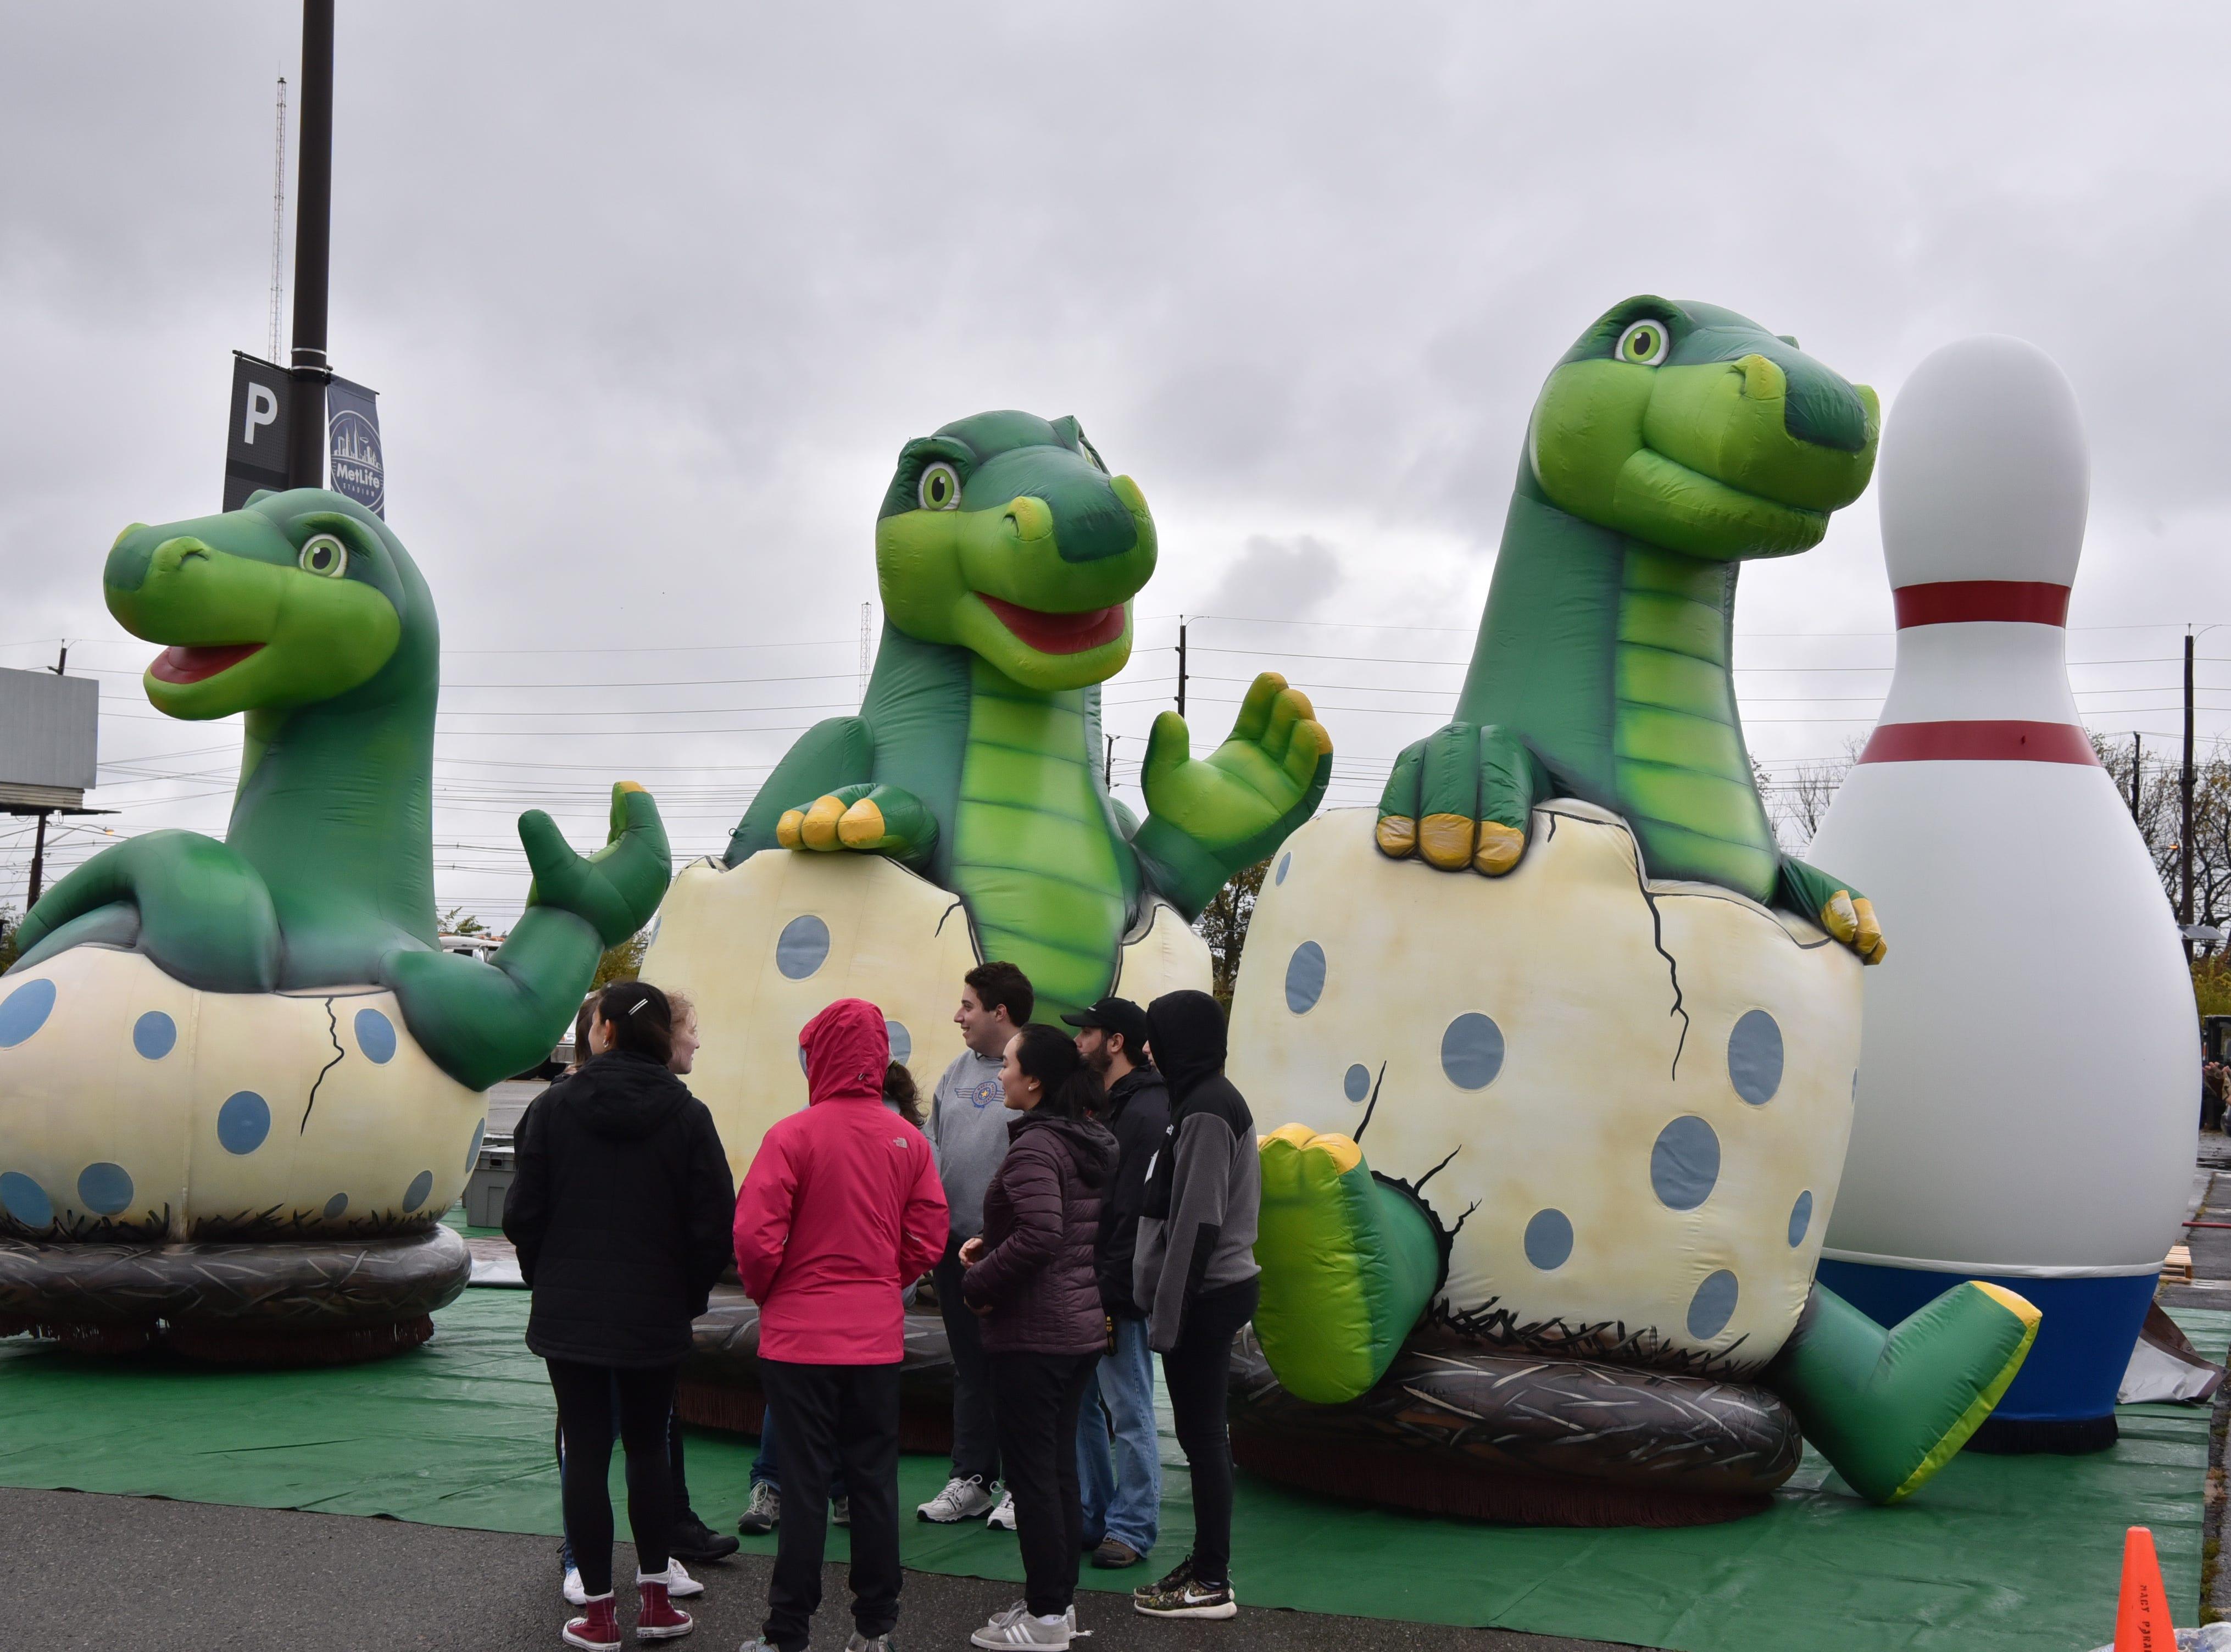 The three newborn Baby Dinos, are tested at MetLife Stadium parking lot on Saturday, November 3.